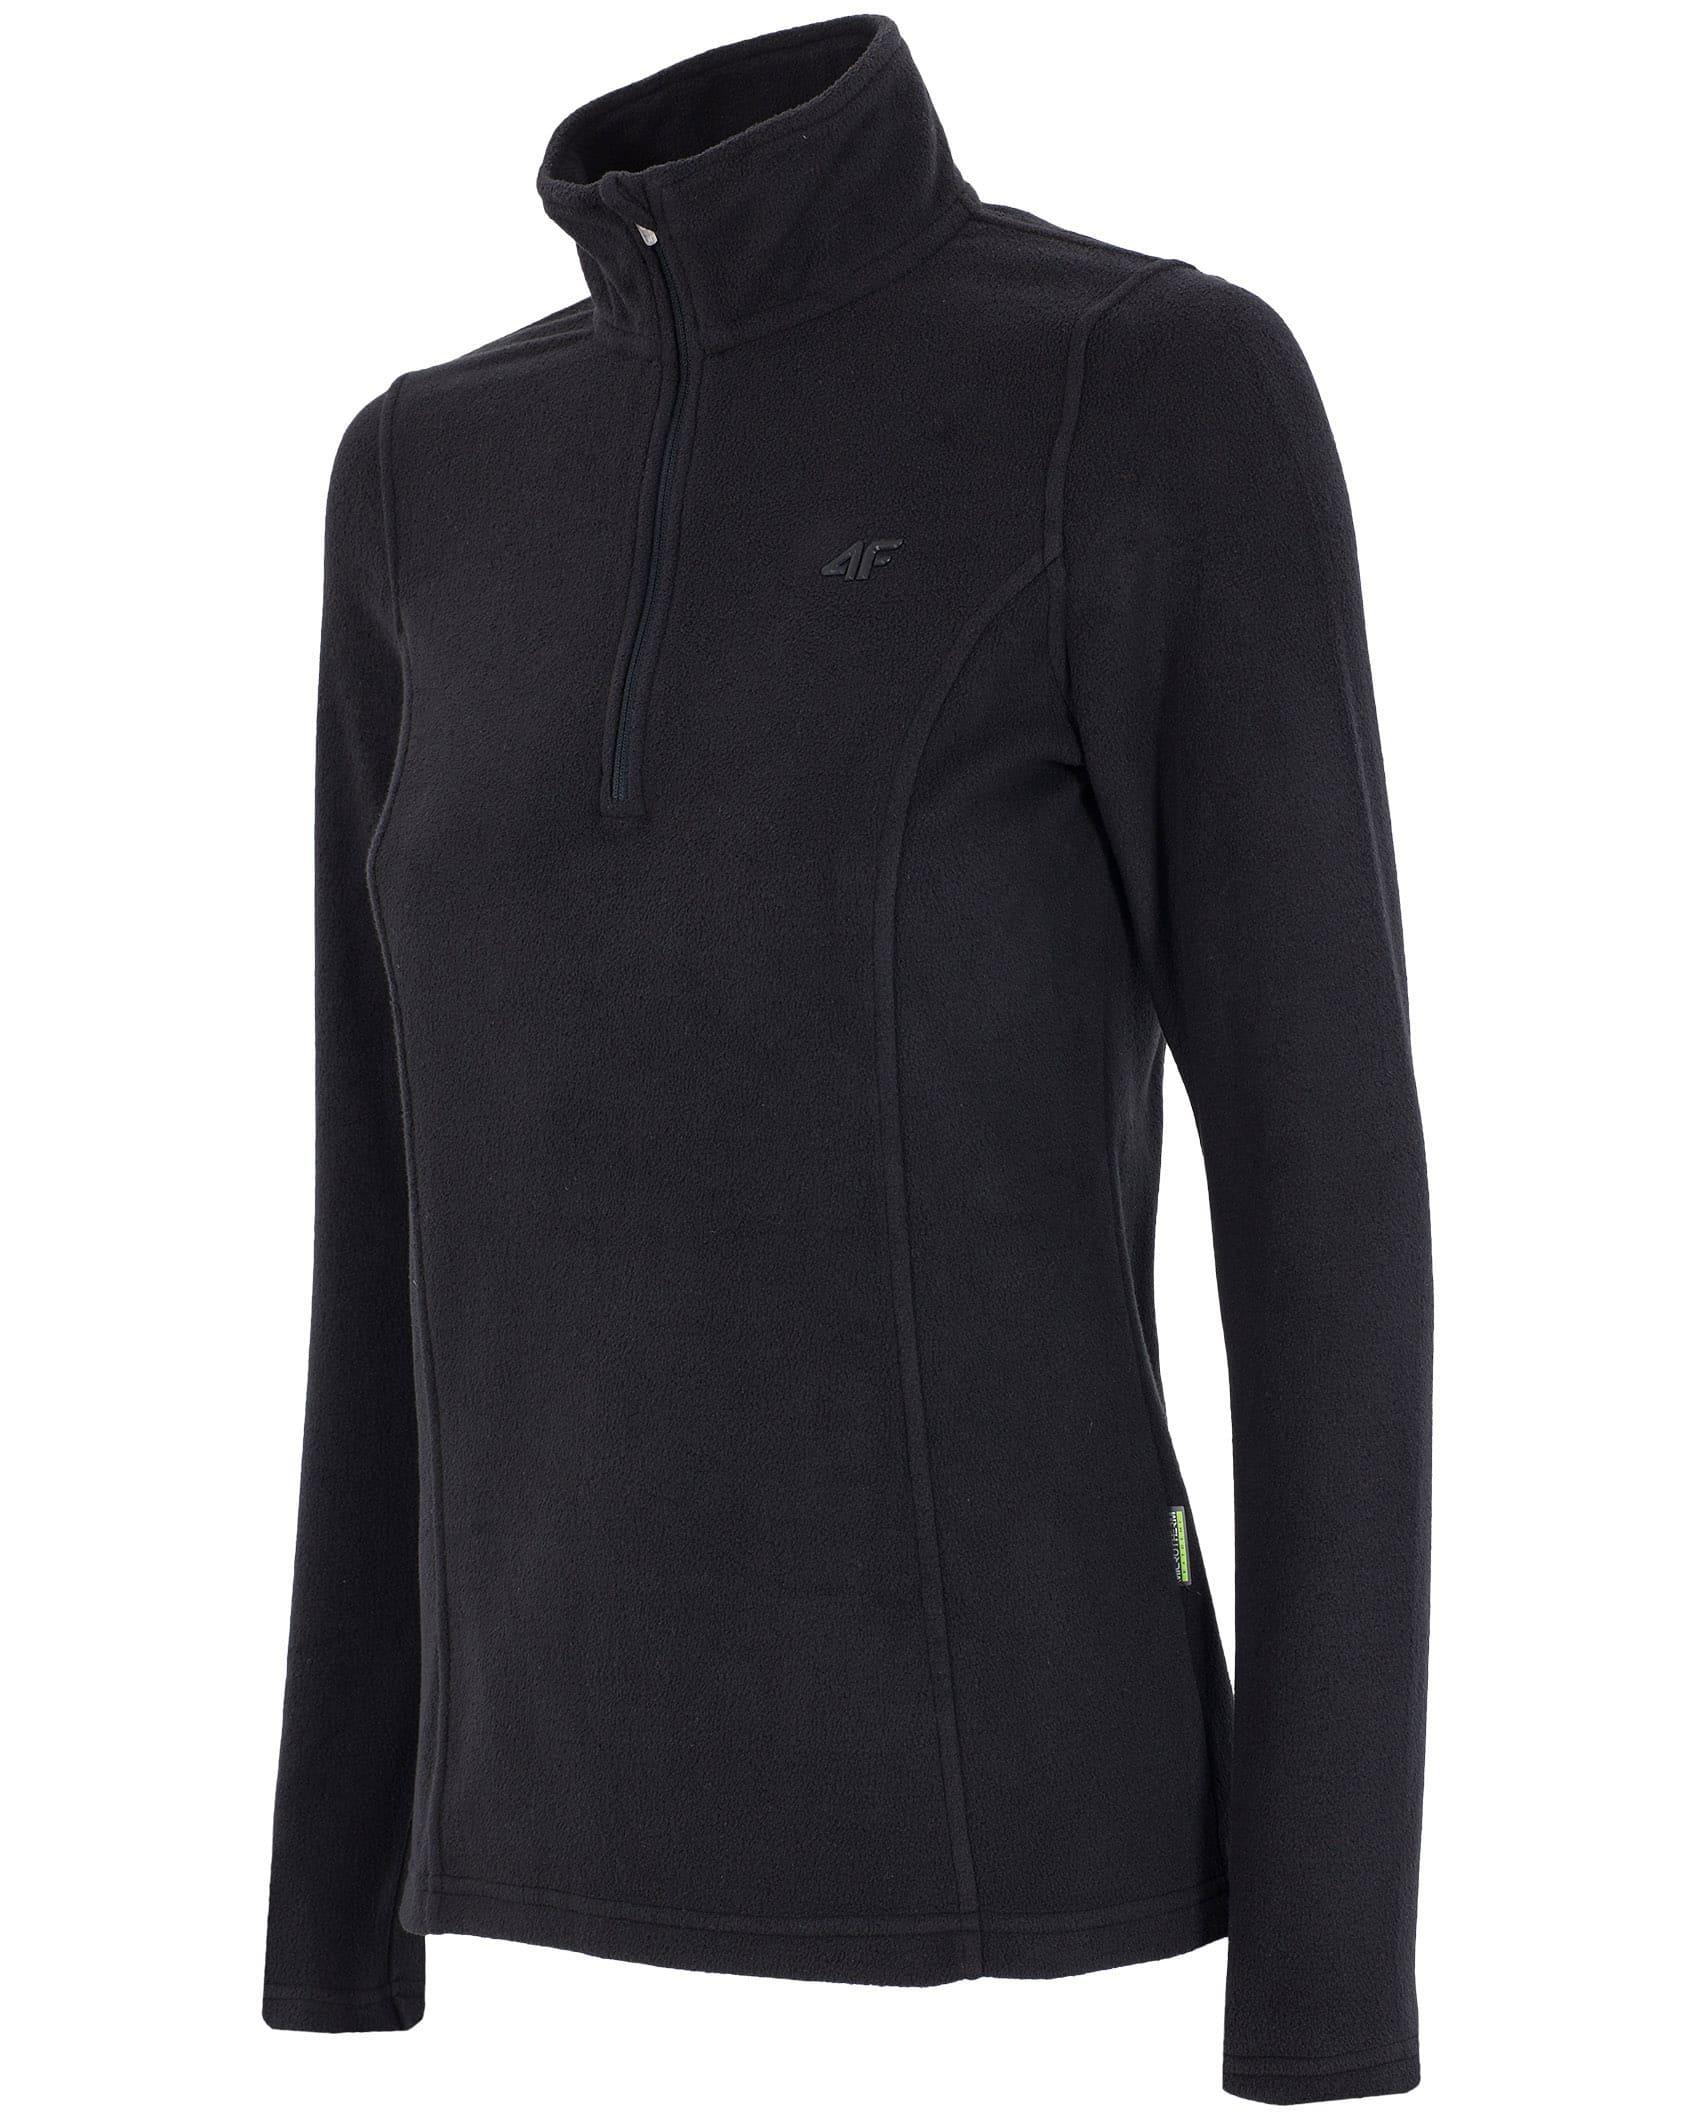 4F Fleece Underwear - Black